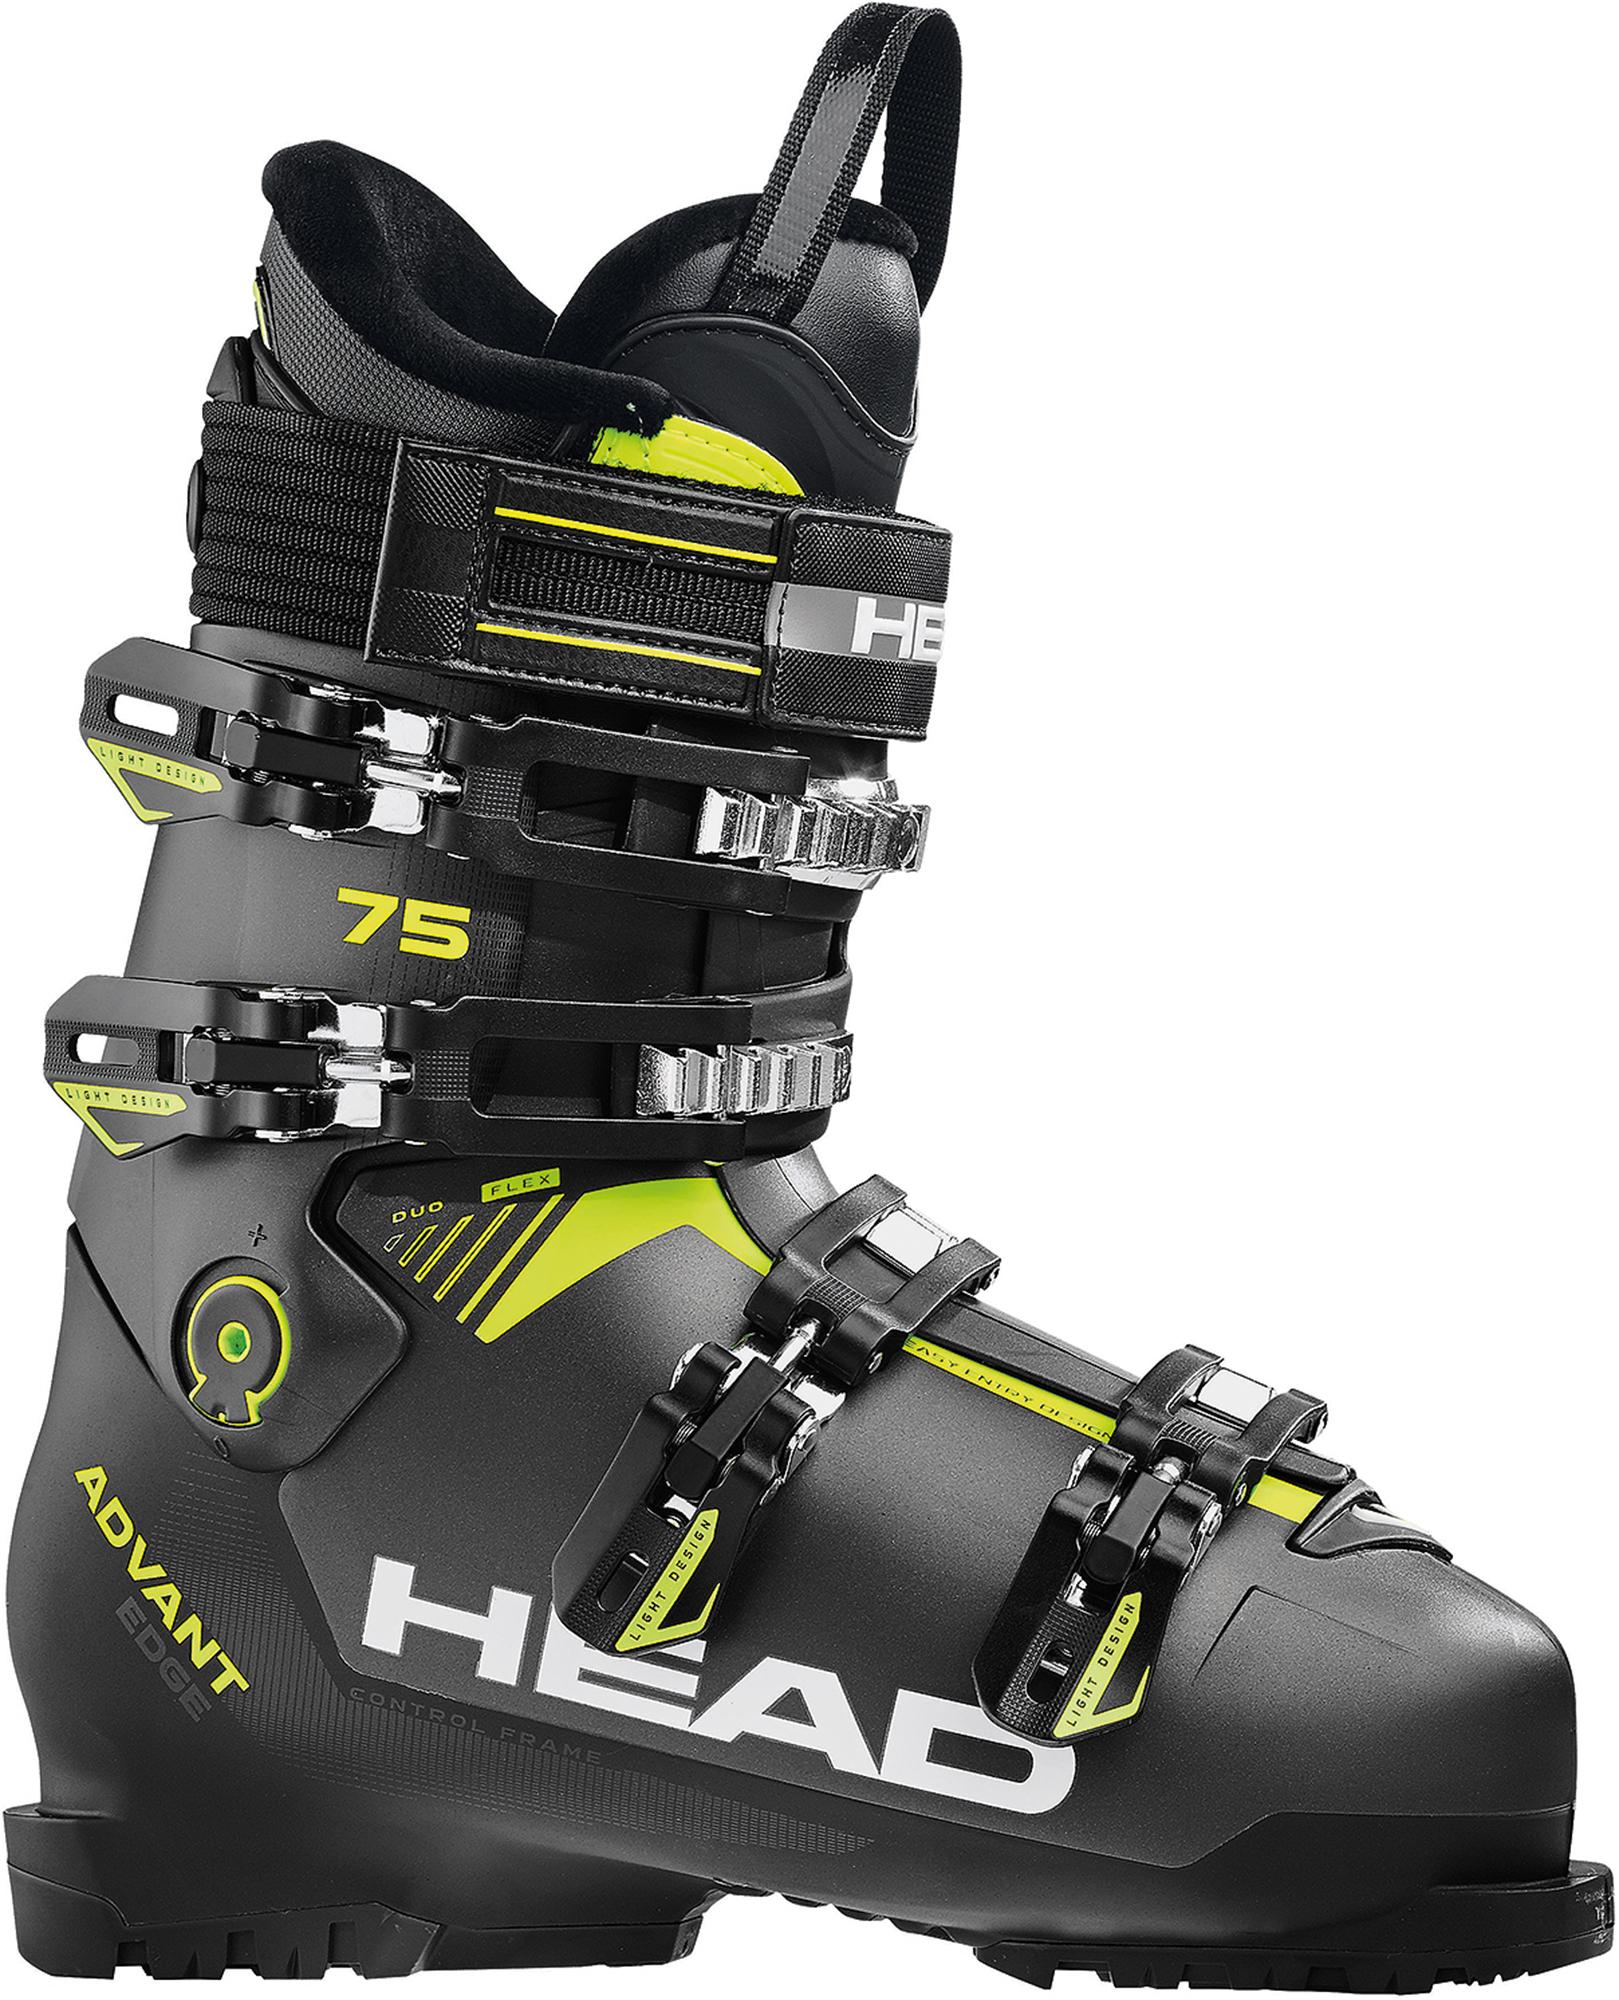 Head Ботинки горнолыжные Advant EDGE 75, размер 29,5 см